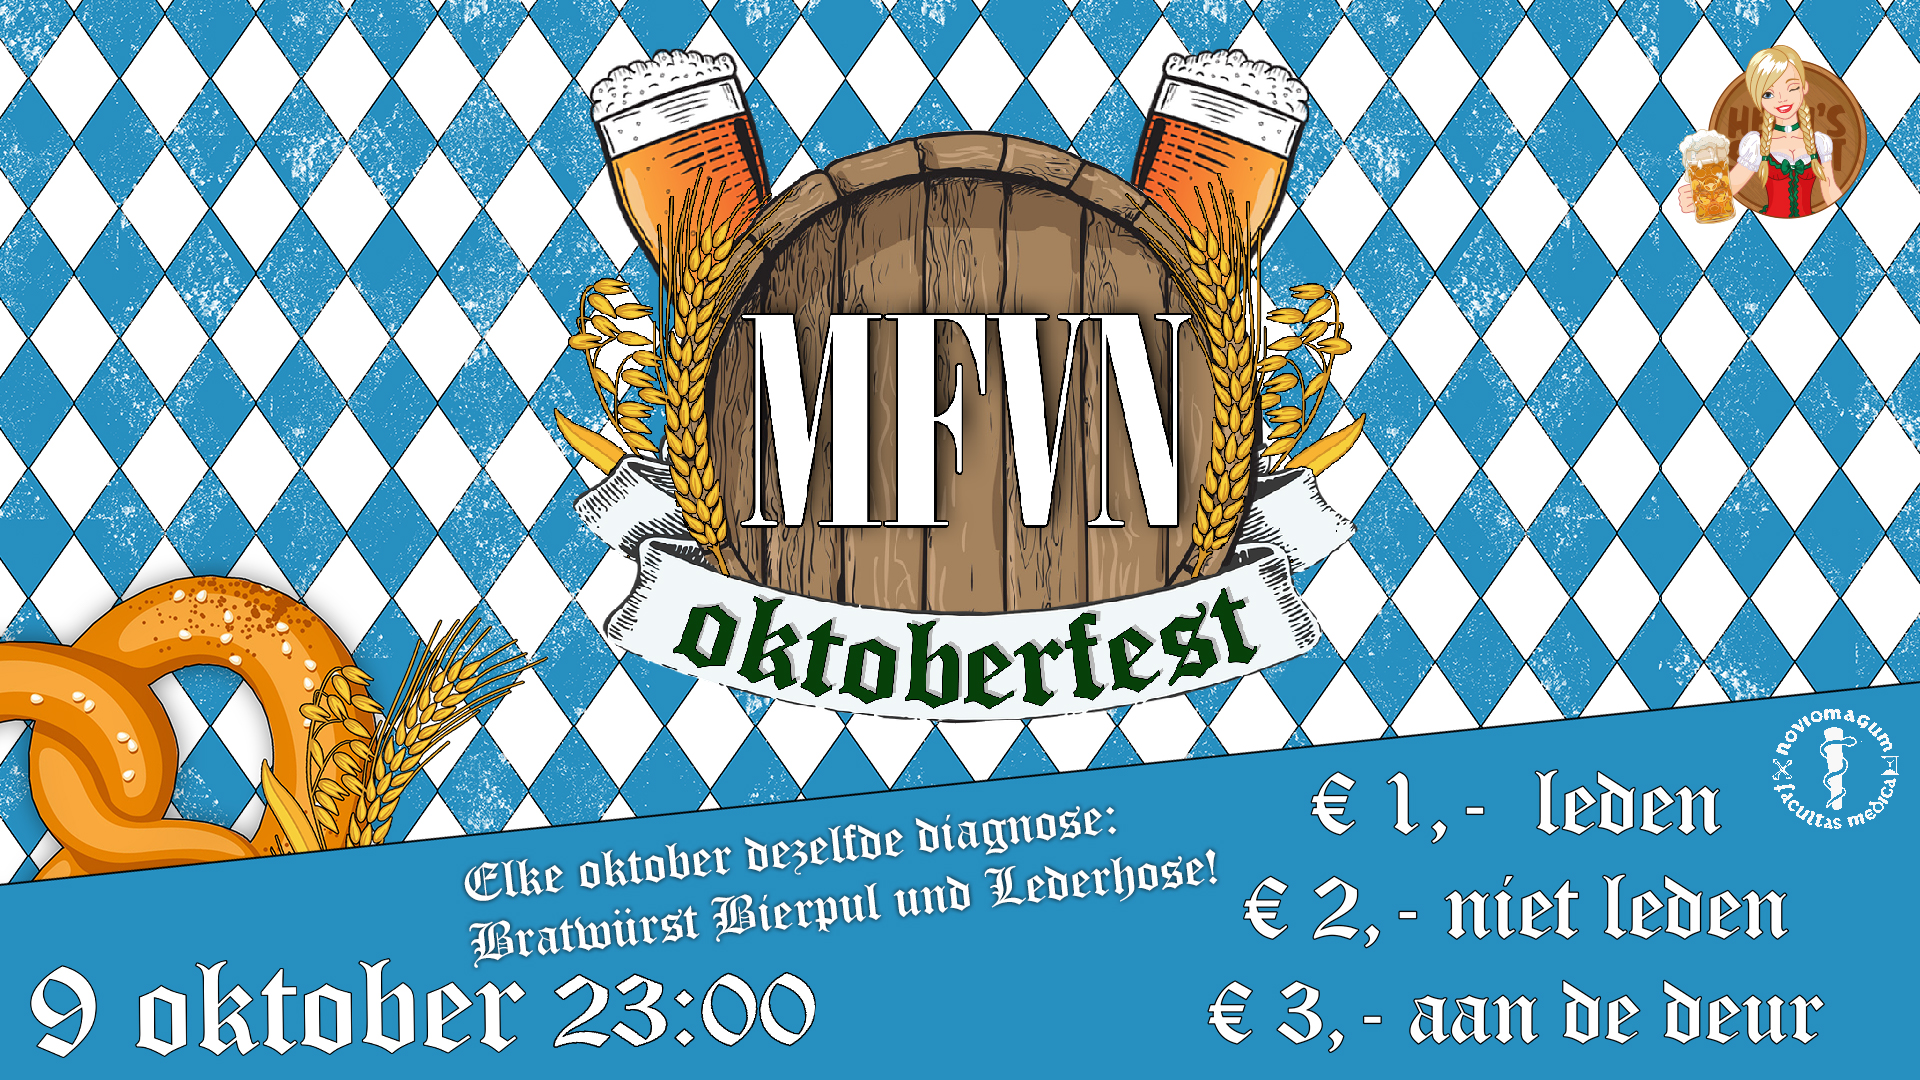 MFVN-Oktoberfest